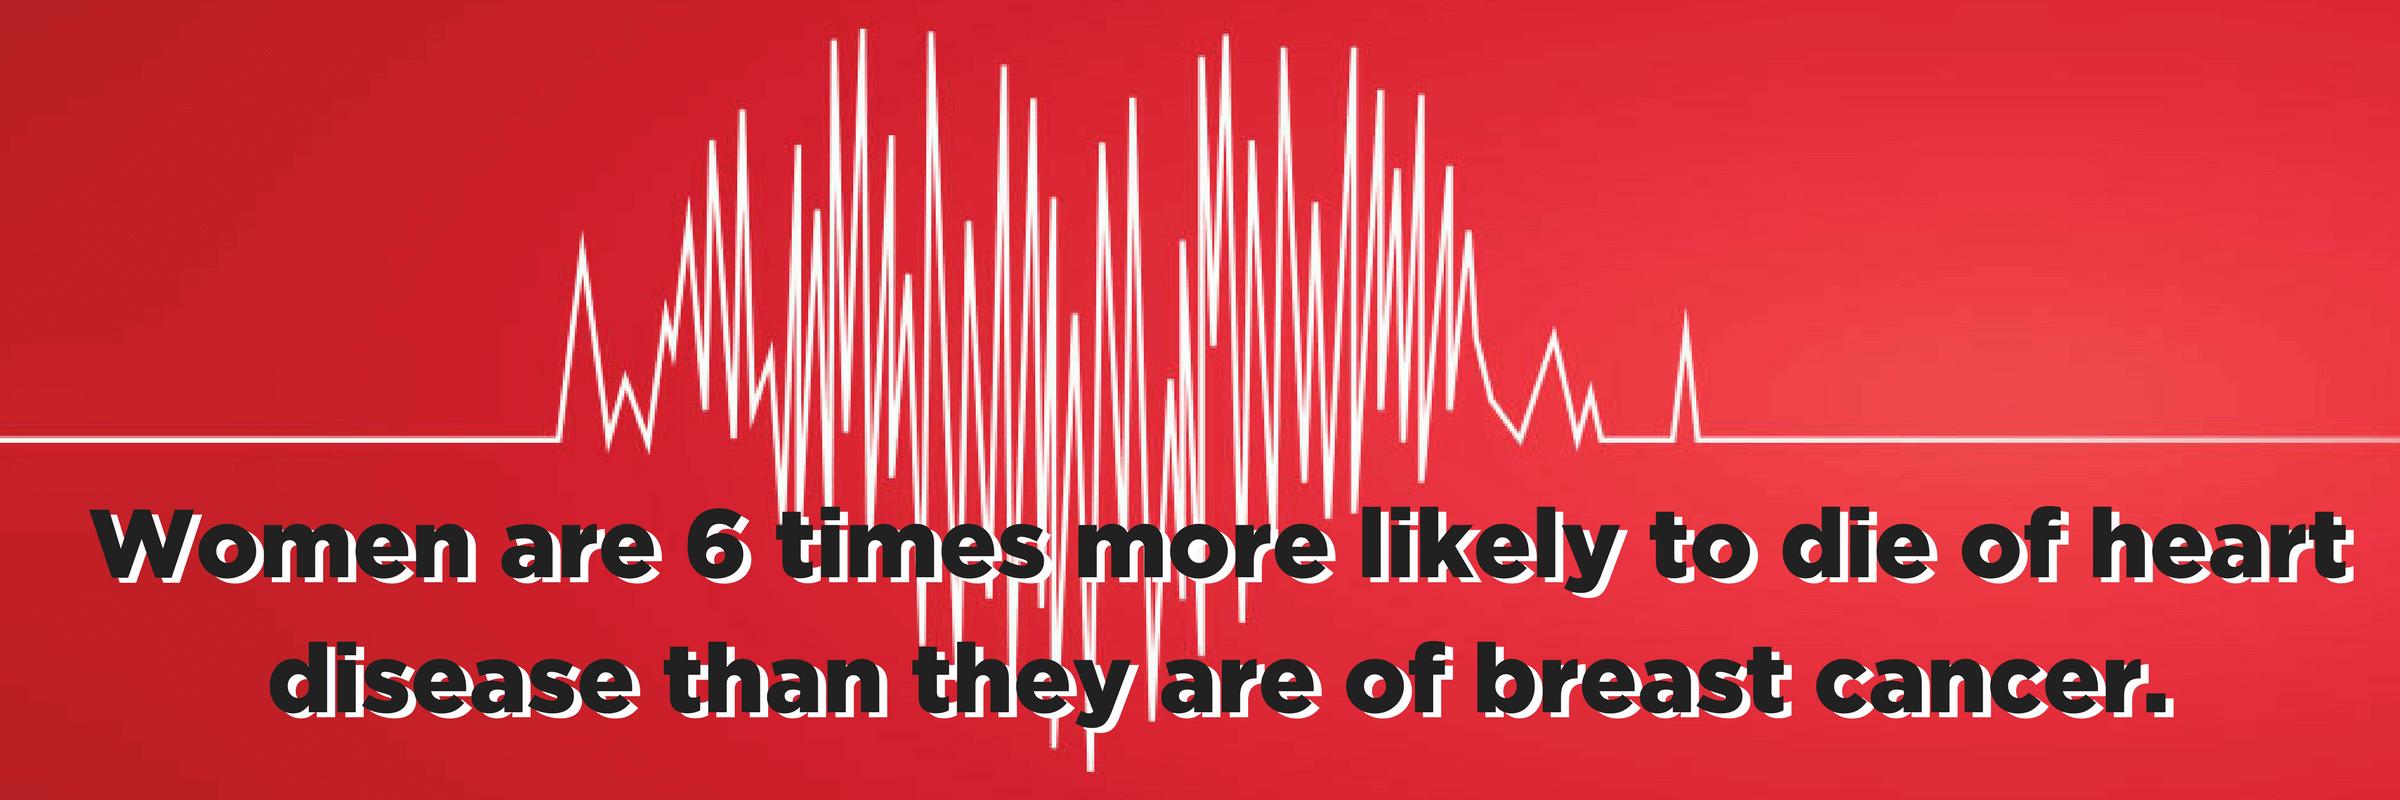 Healthy Heart Blog Insert